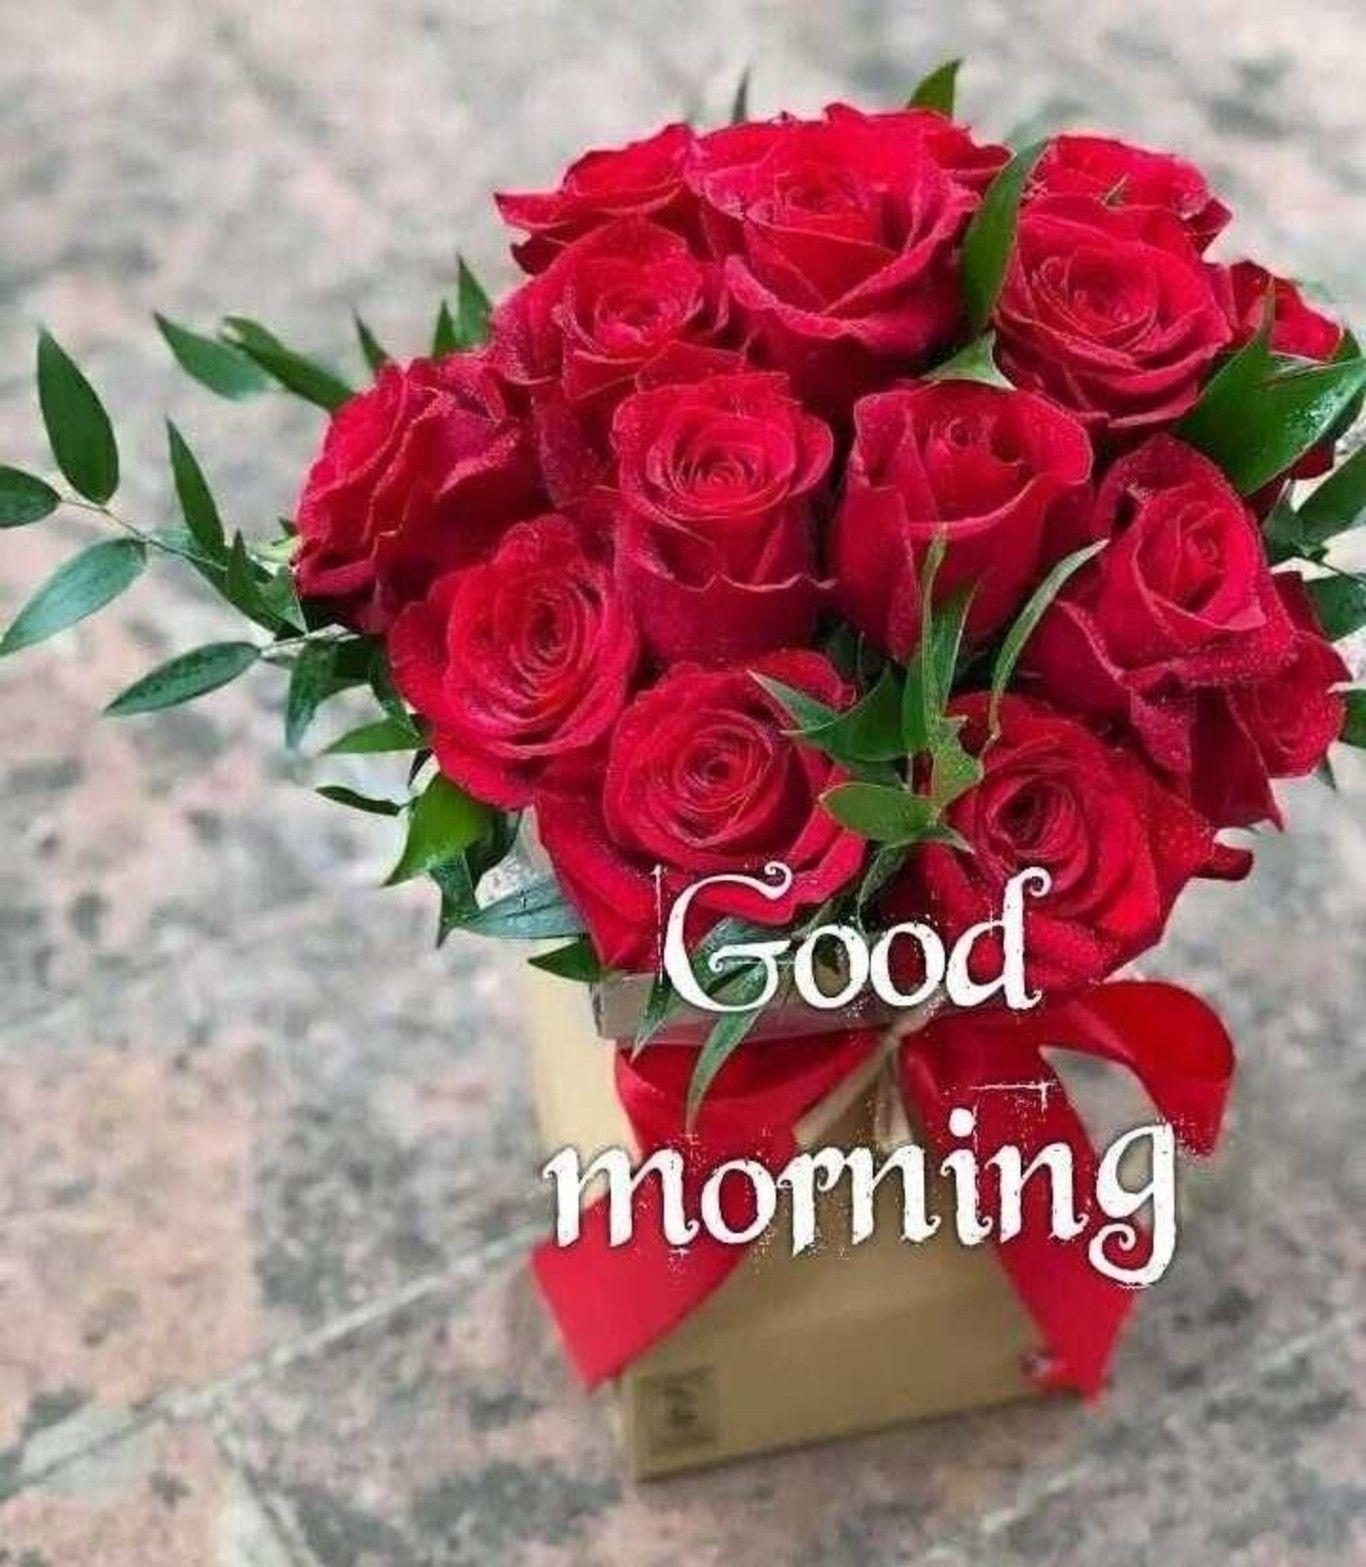 Pin By Tina Imaromna On Morning Good Morning Flowers Good Morning Roses Good Morning Nature